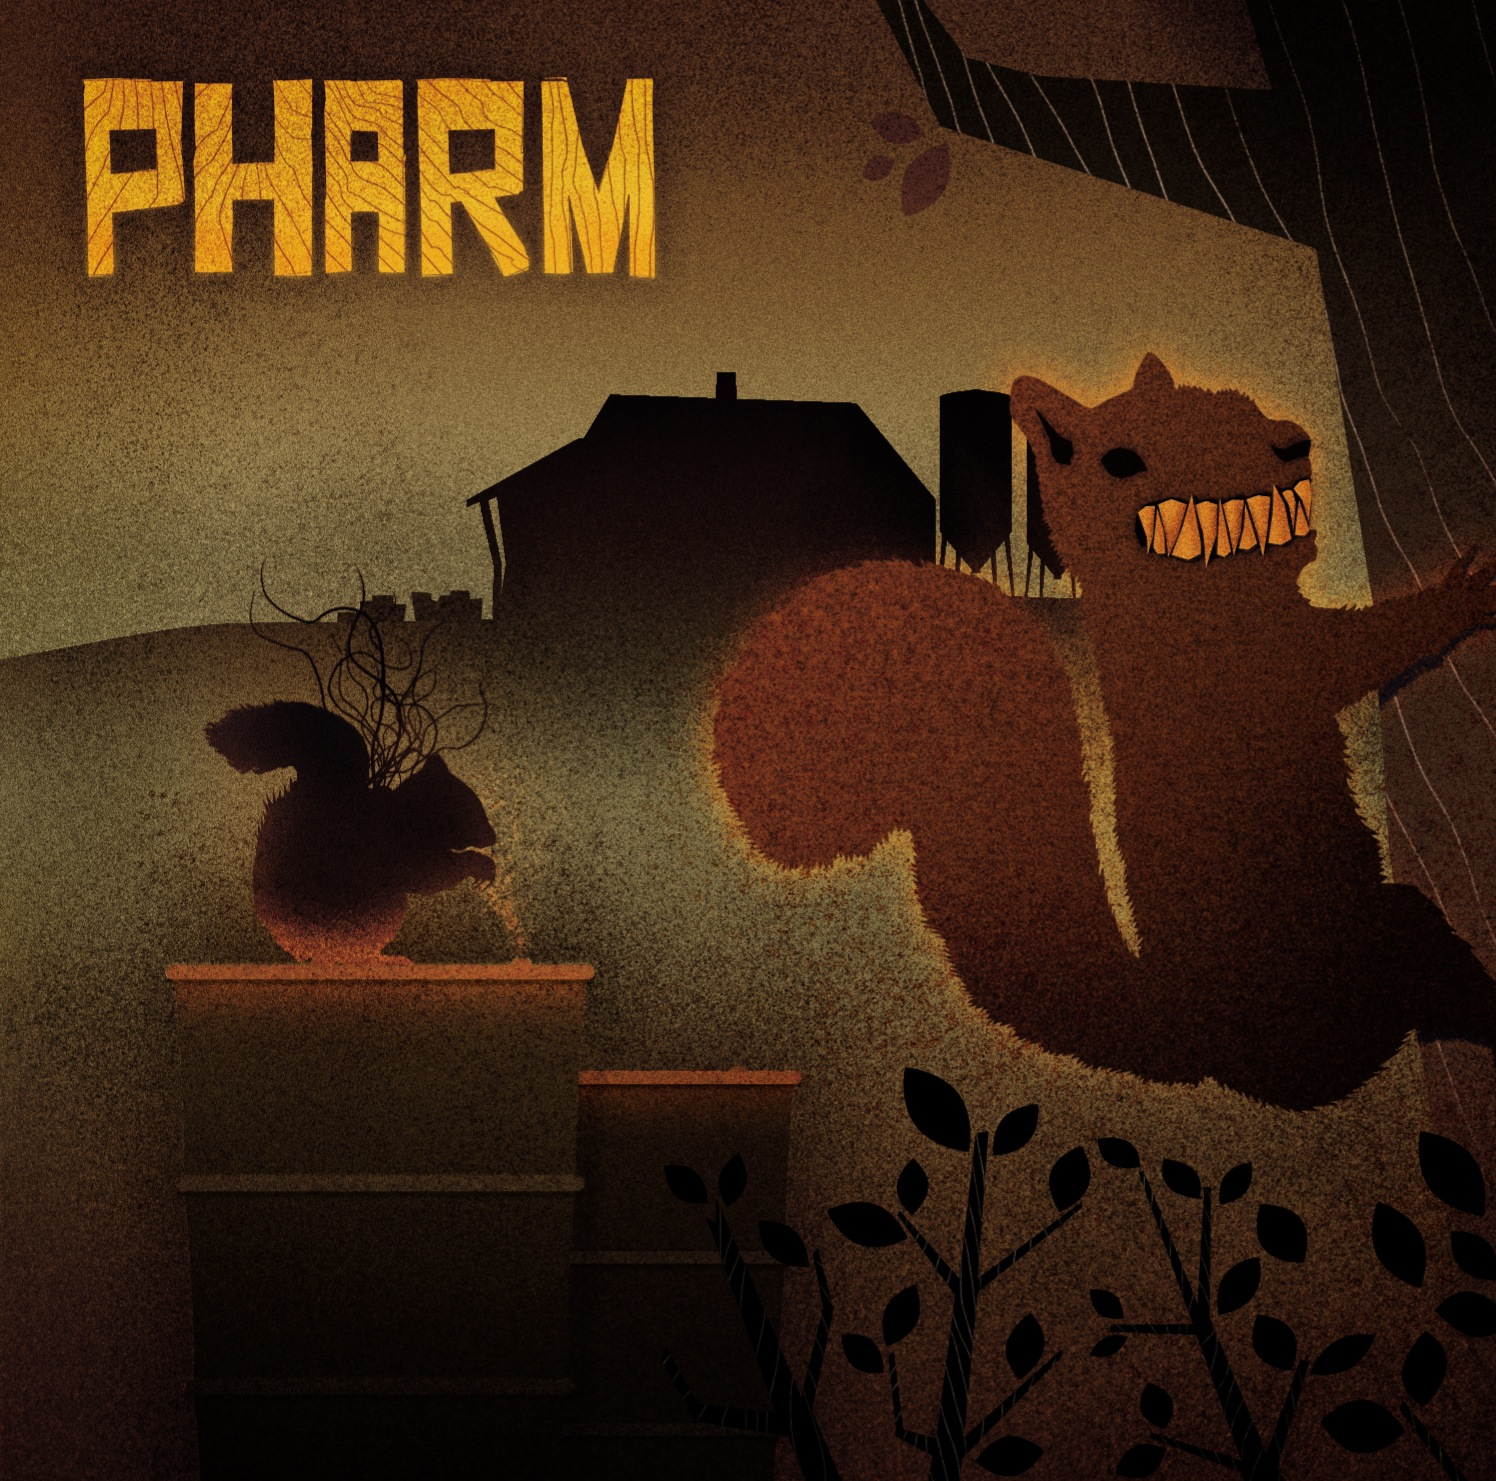 pharm